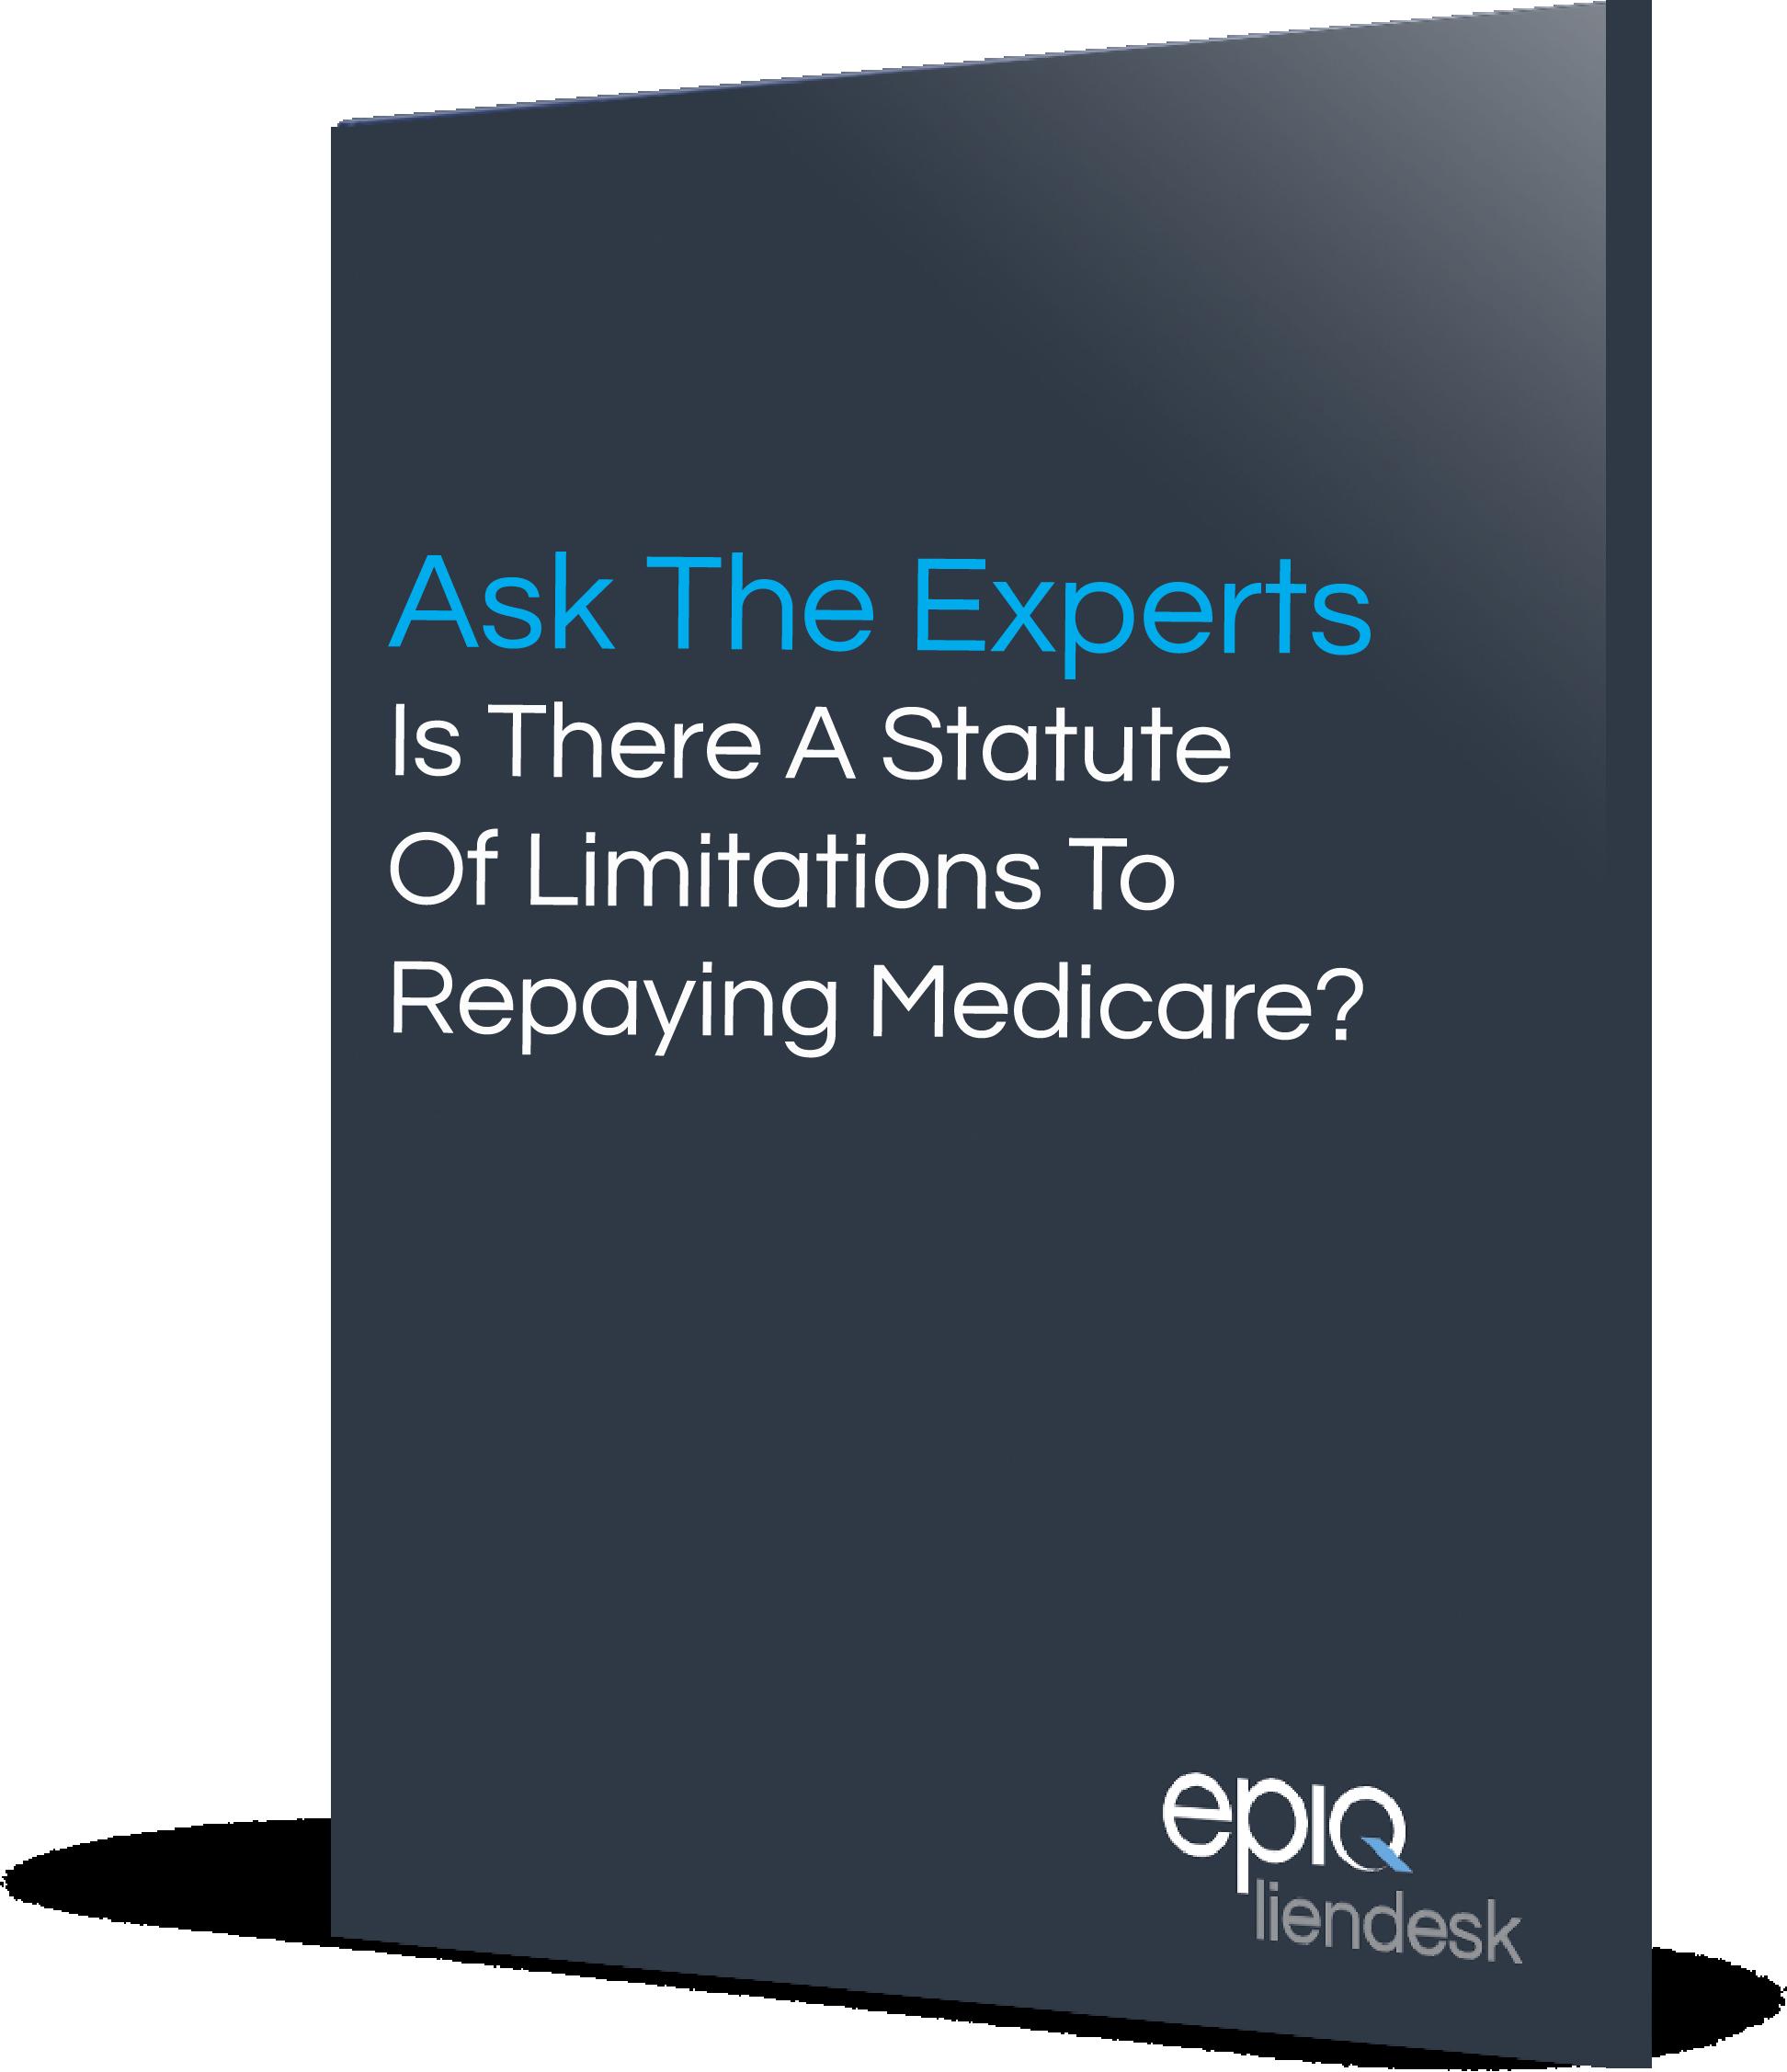 Repaying Medicare